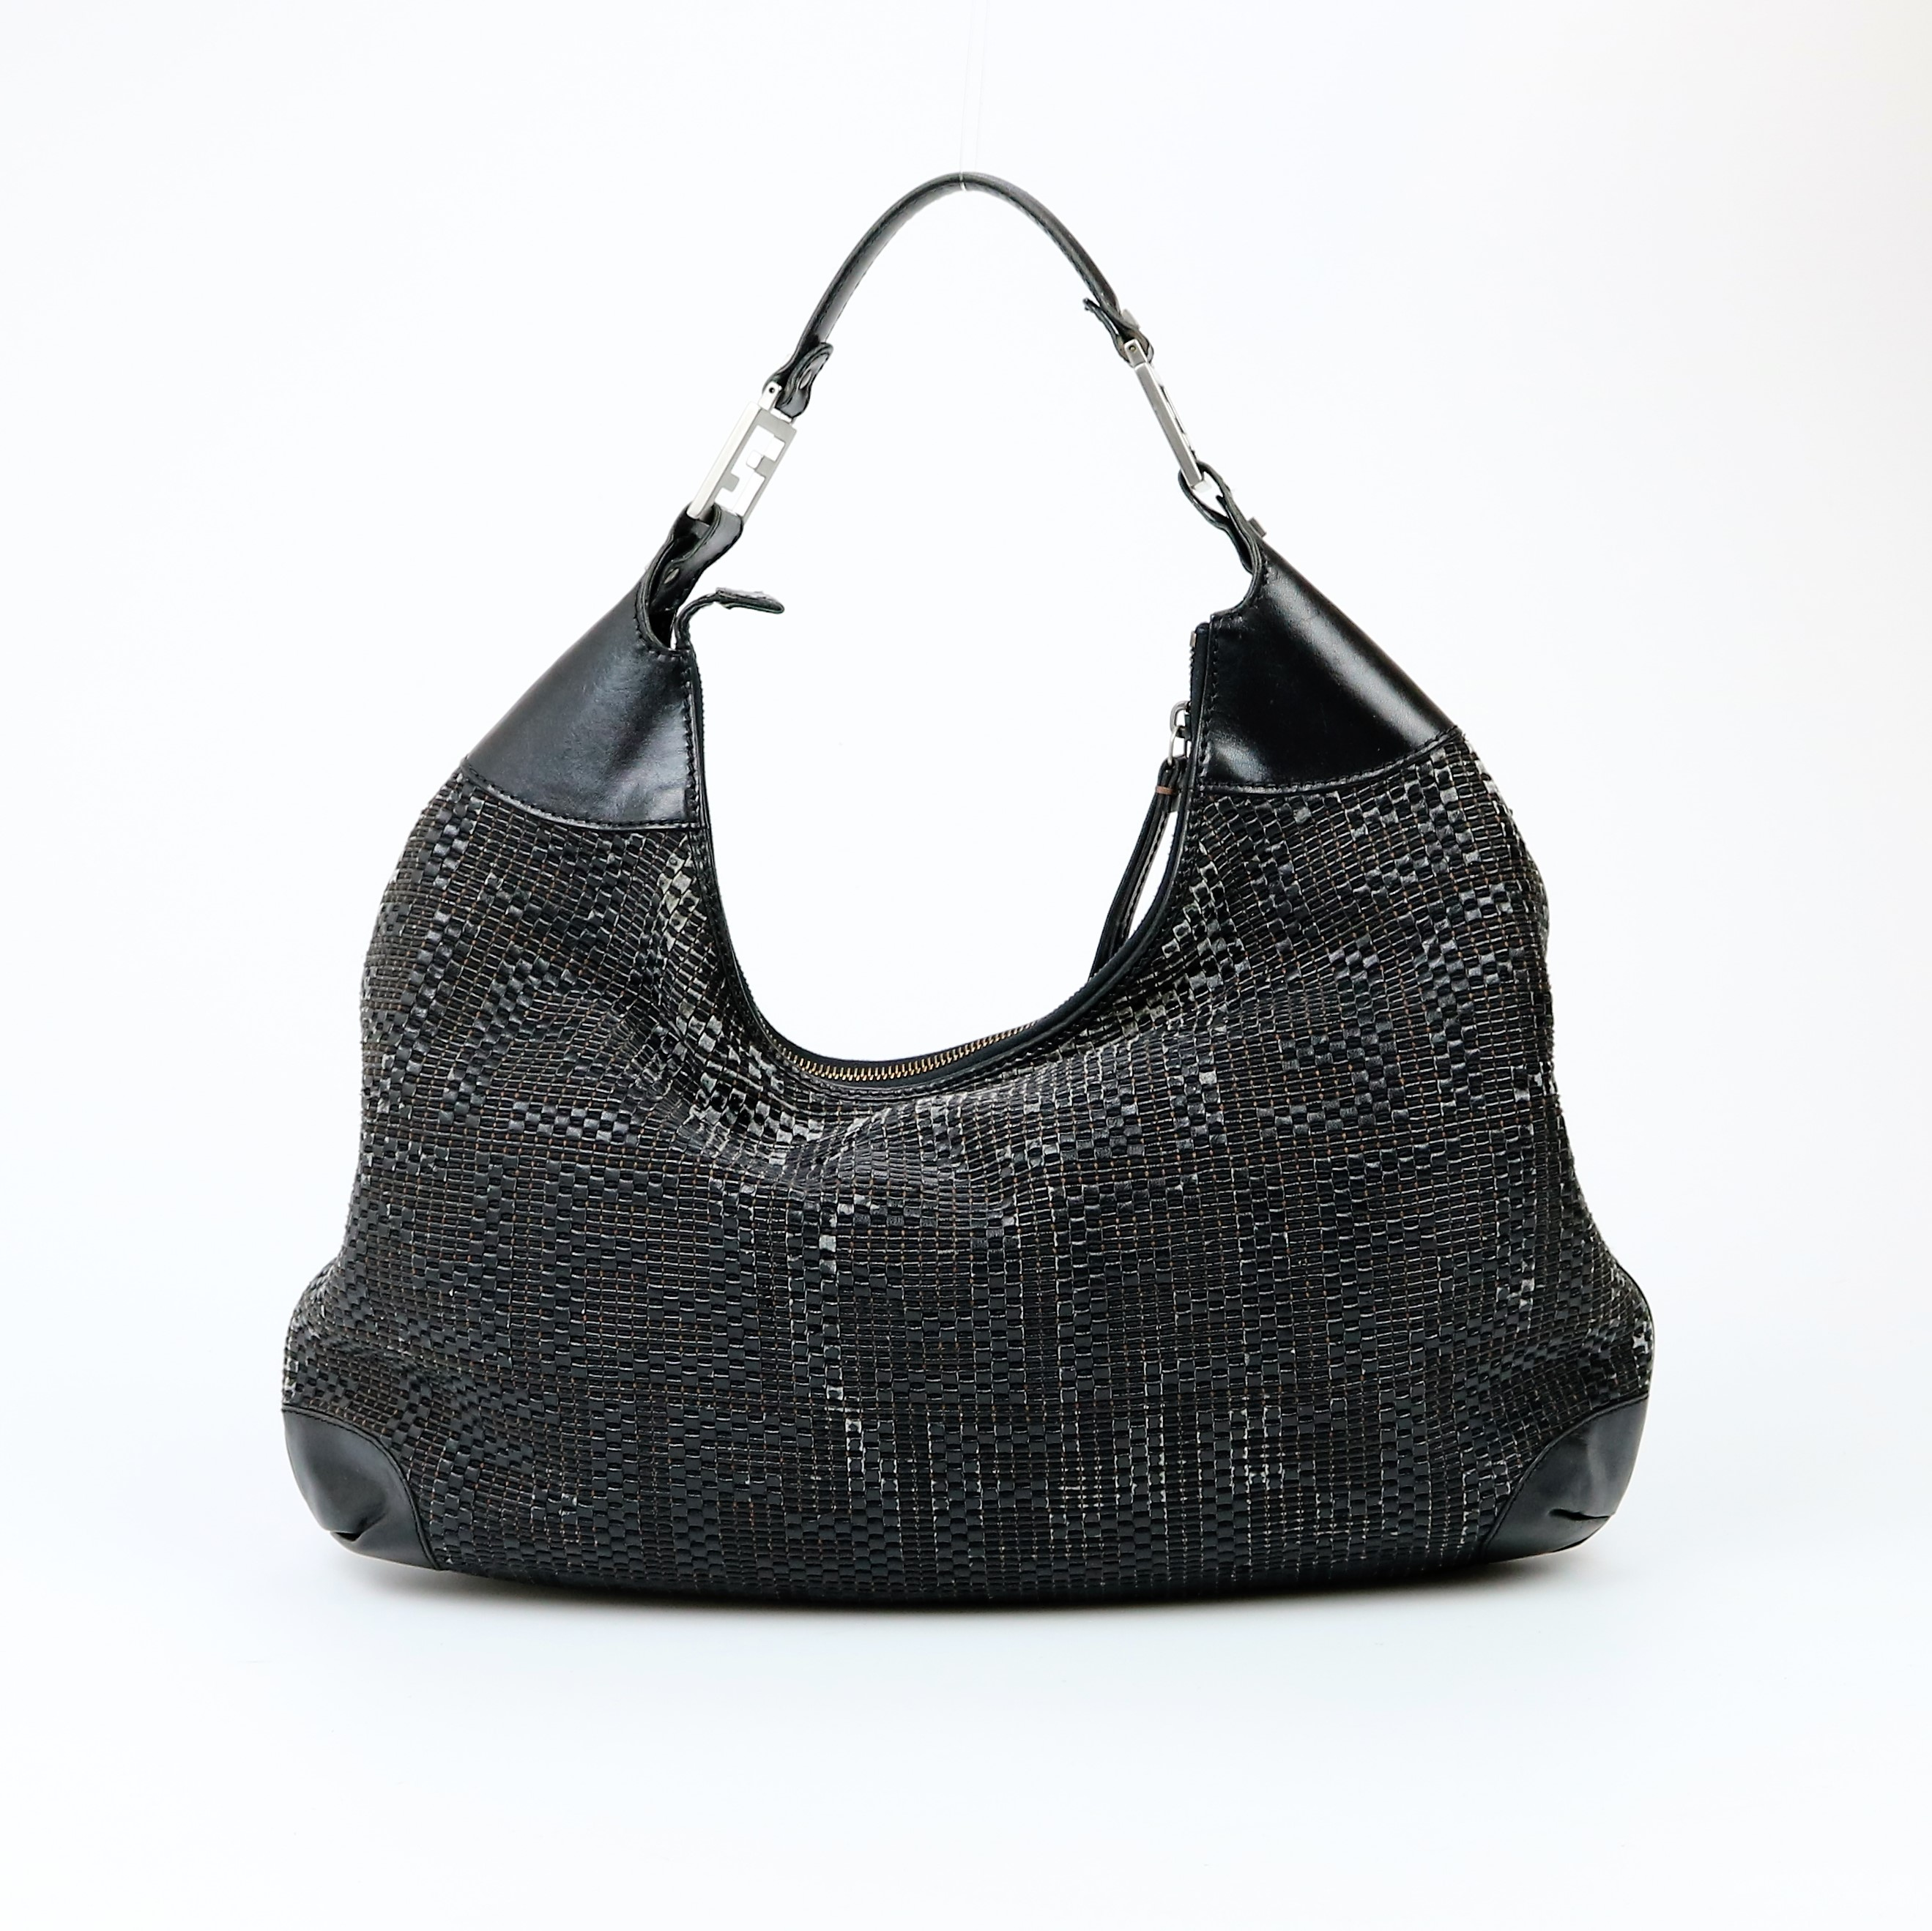 337a05869b3 ... spain fendi zucca woven leather hobo bag 804af 0df26 ...